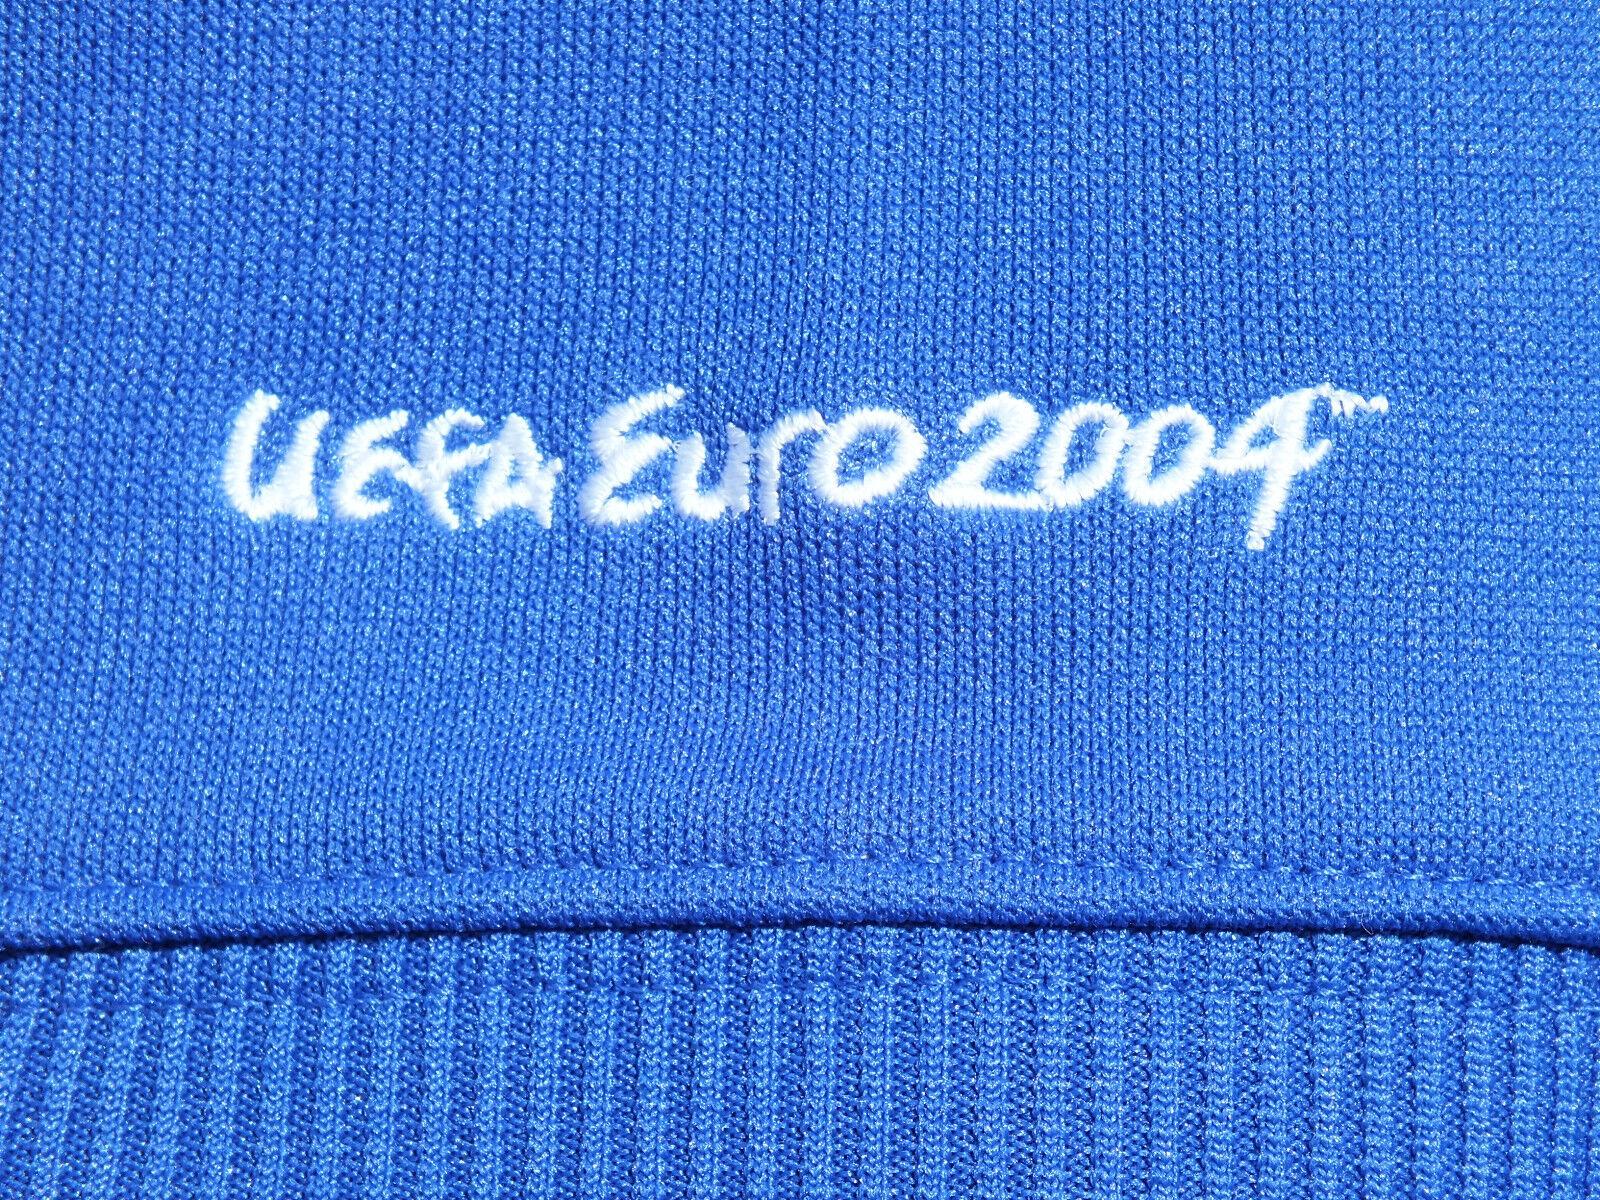 Campionati Bnwt Rari Francia Adidas Ufficiale 2004 Euro xzfagvwq4